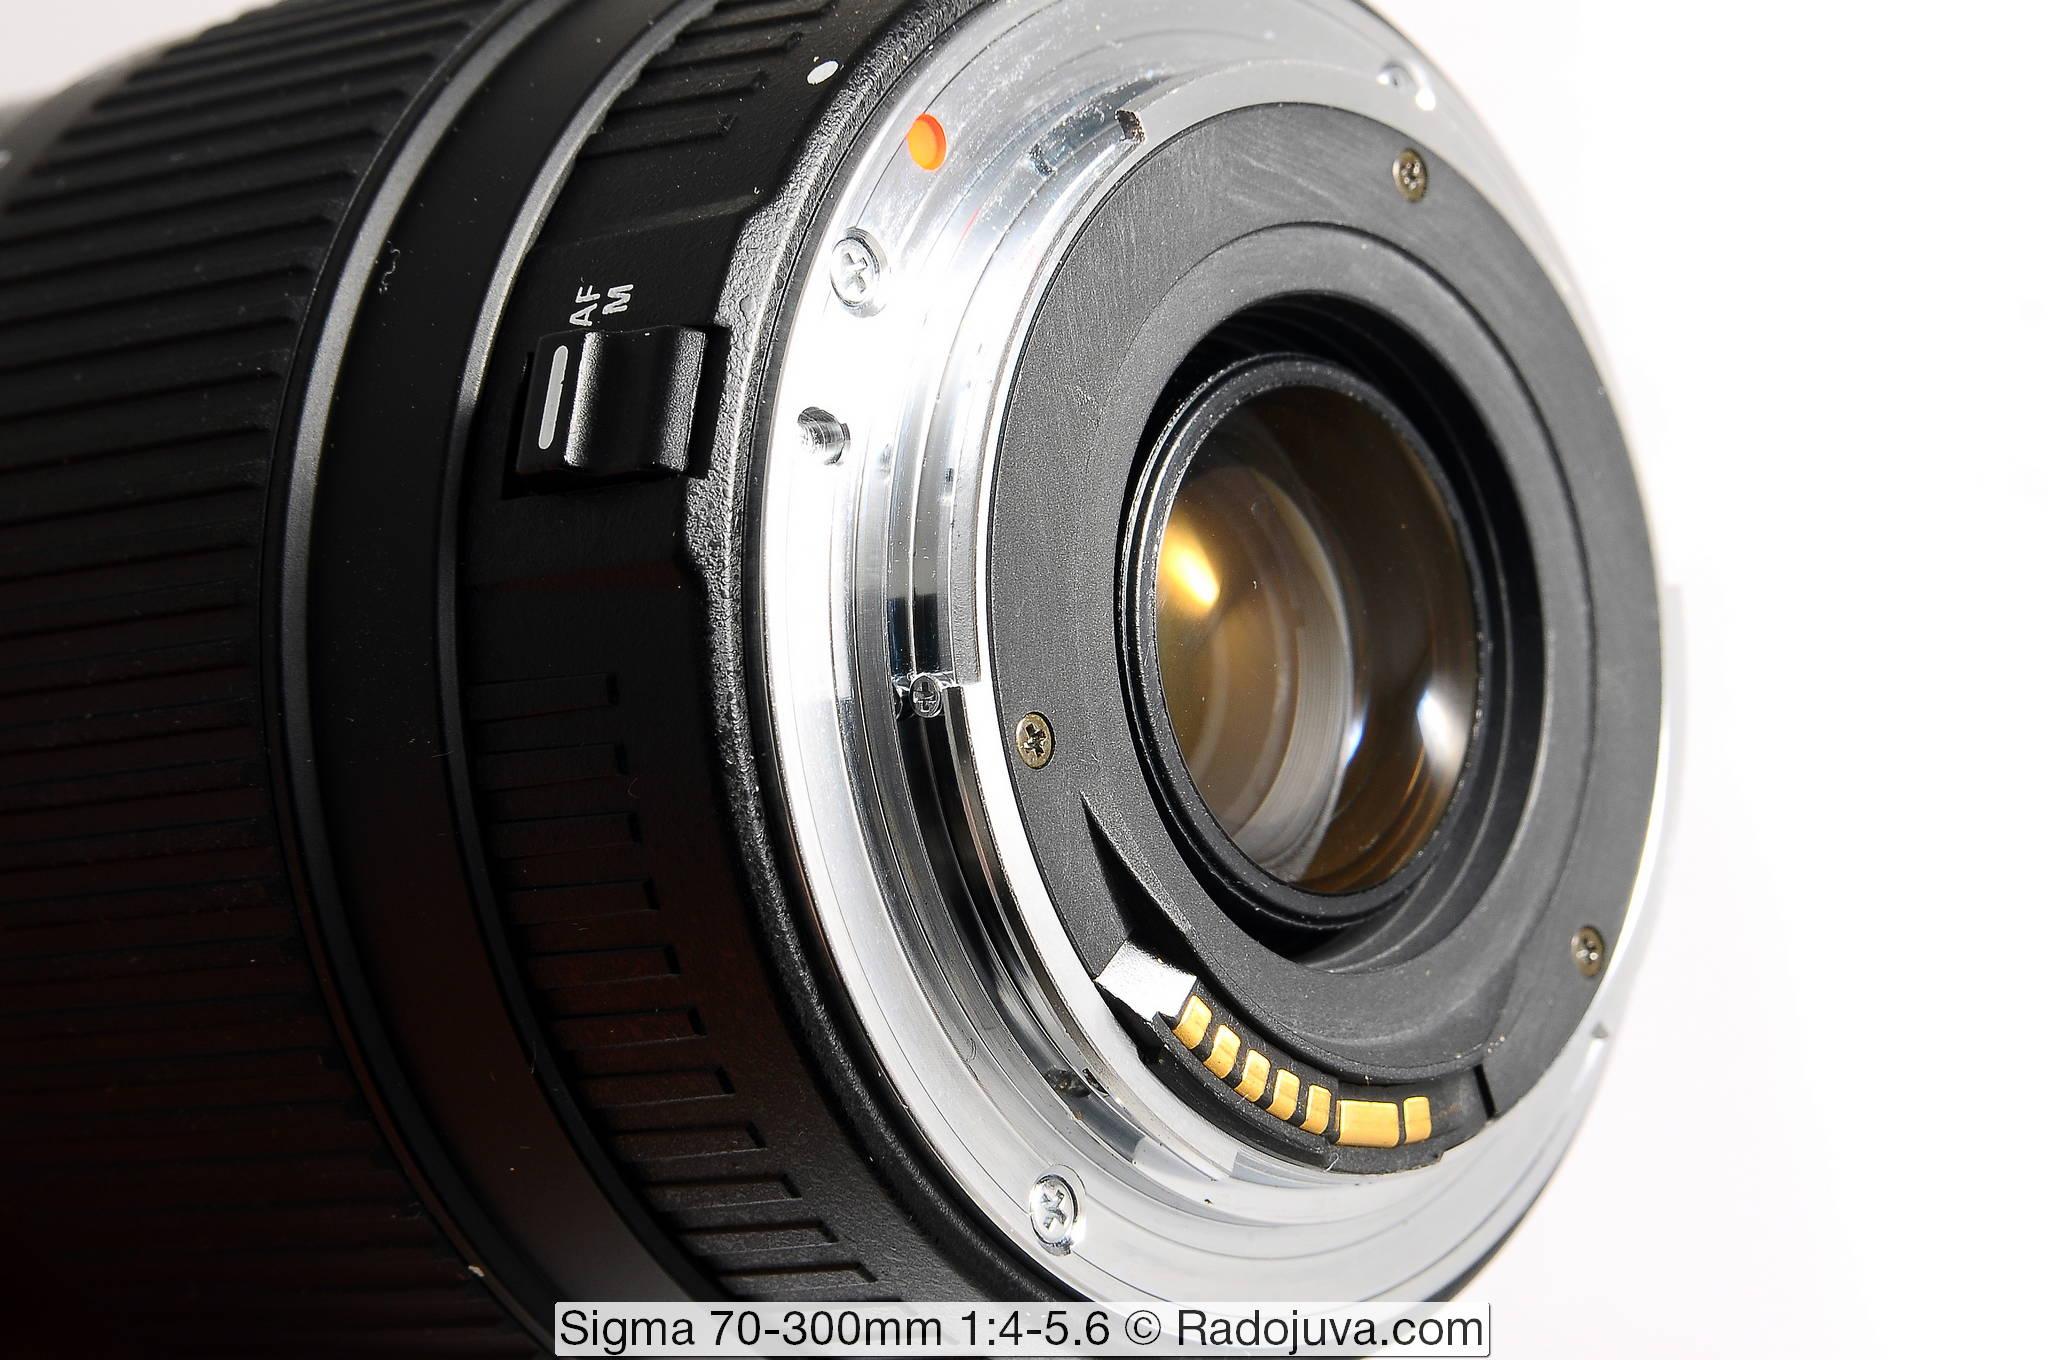 Sigma 70-300mm 1:4-5.6